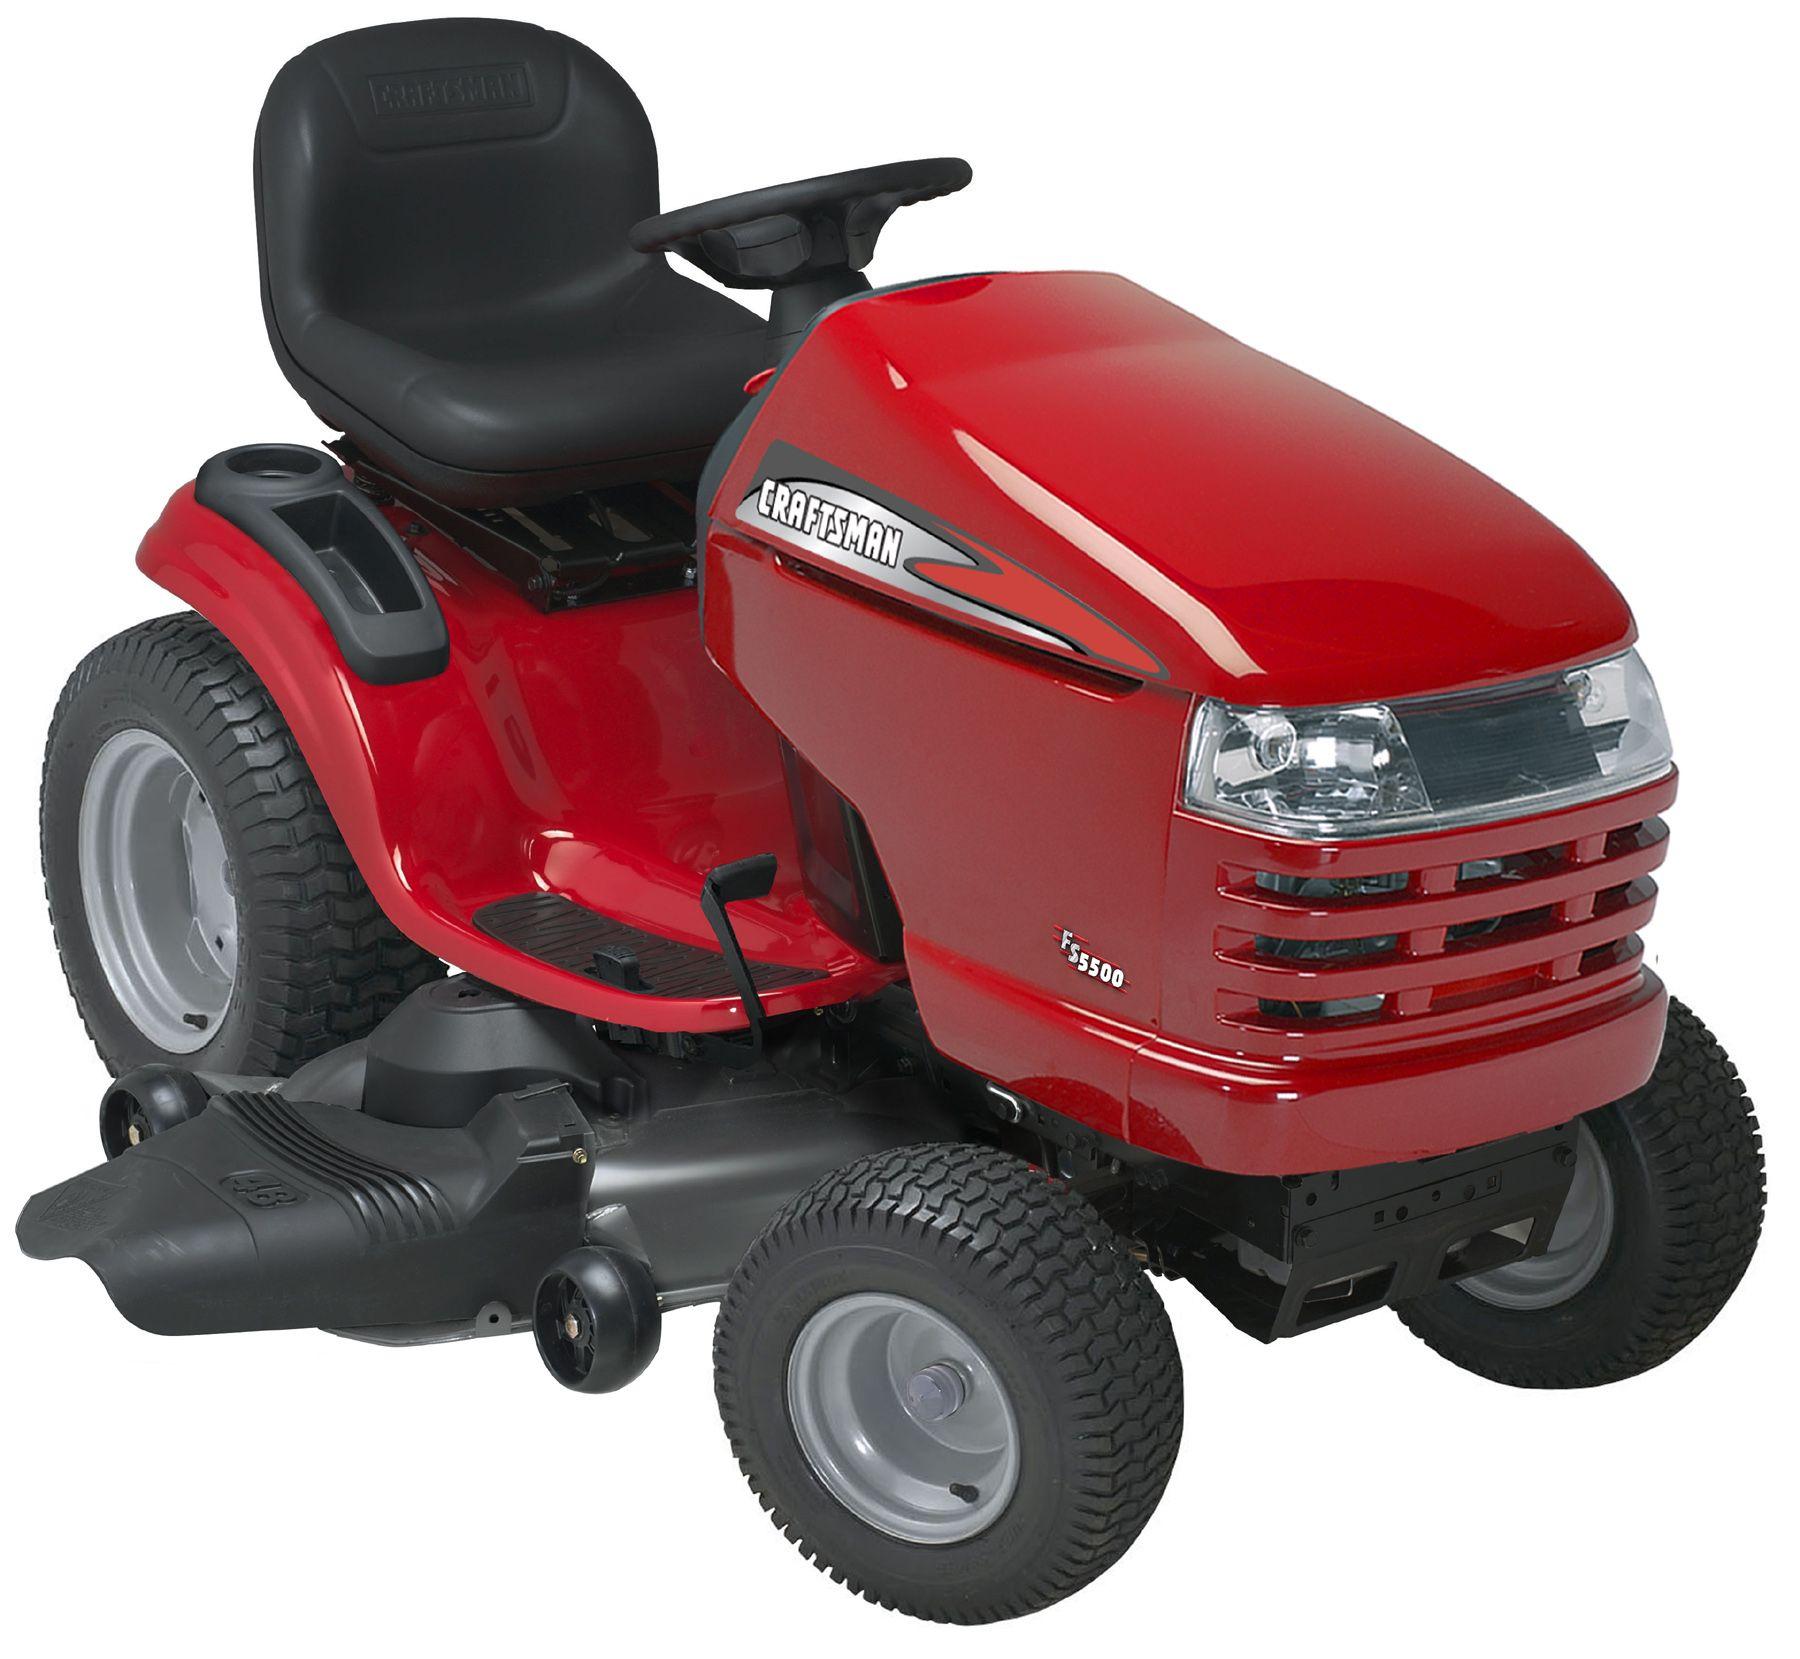 medium resolution of spin prod 210956701 wid 200 hei 250 craftsman tractor parts model 917276843 sears partsdirect at cita craftsman riding mower model 917 manual